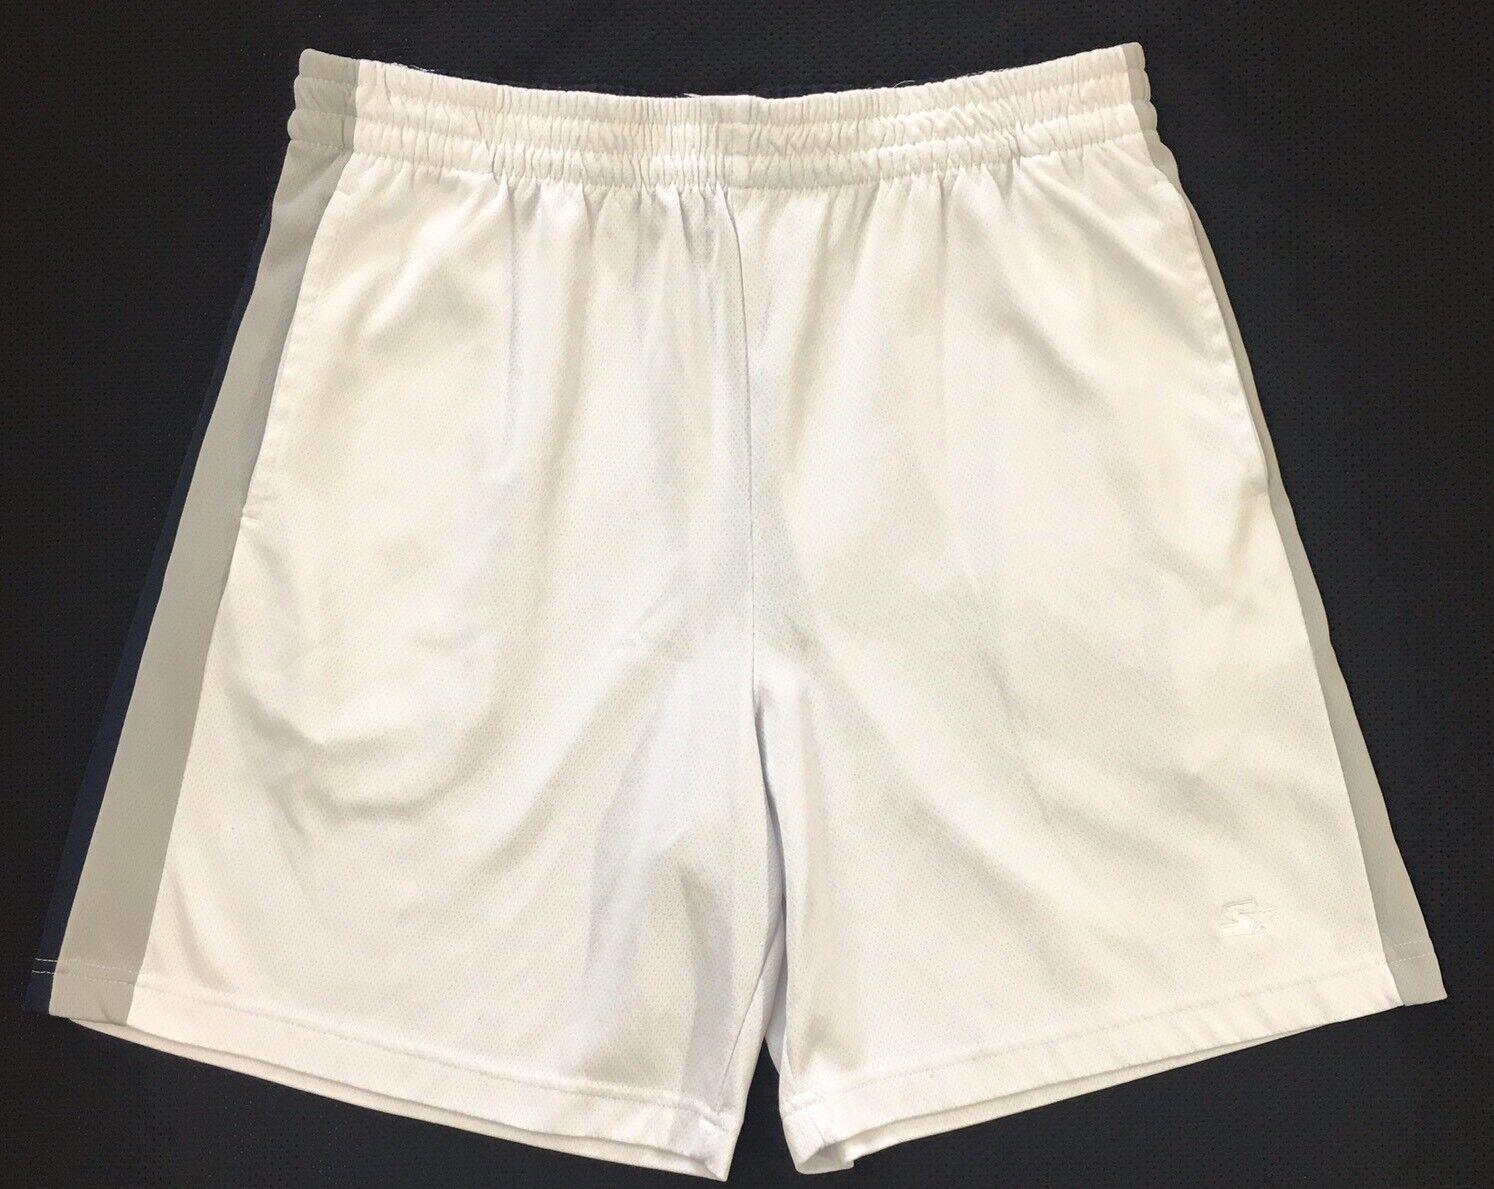 STARTER Men's White Basketball Athletic Shorts Size L Large 36 38